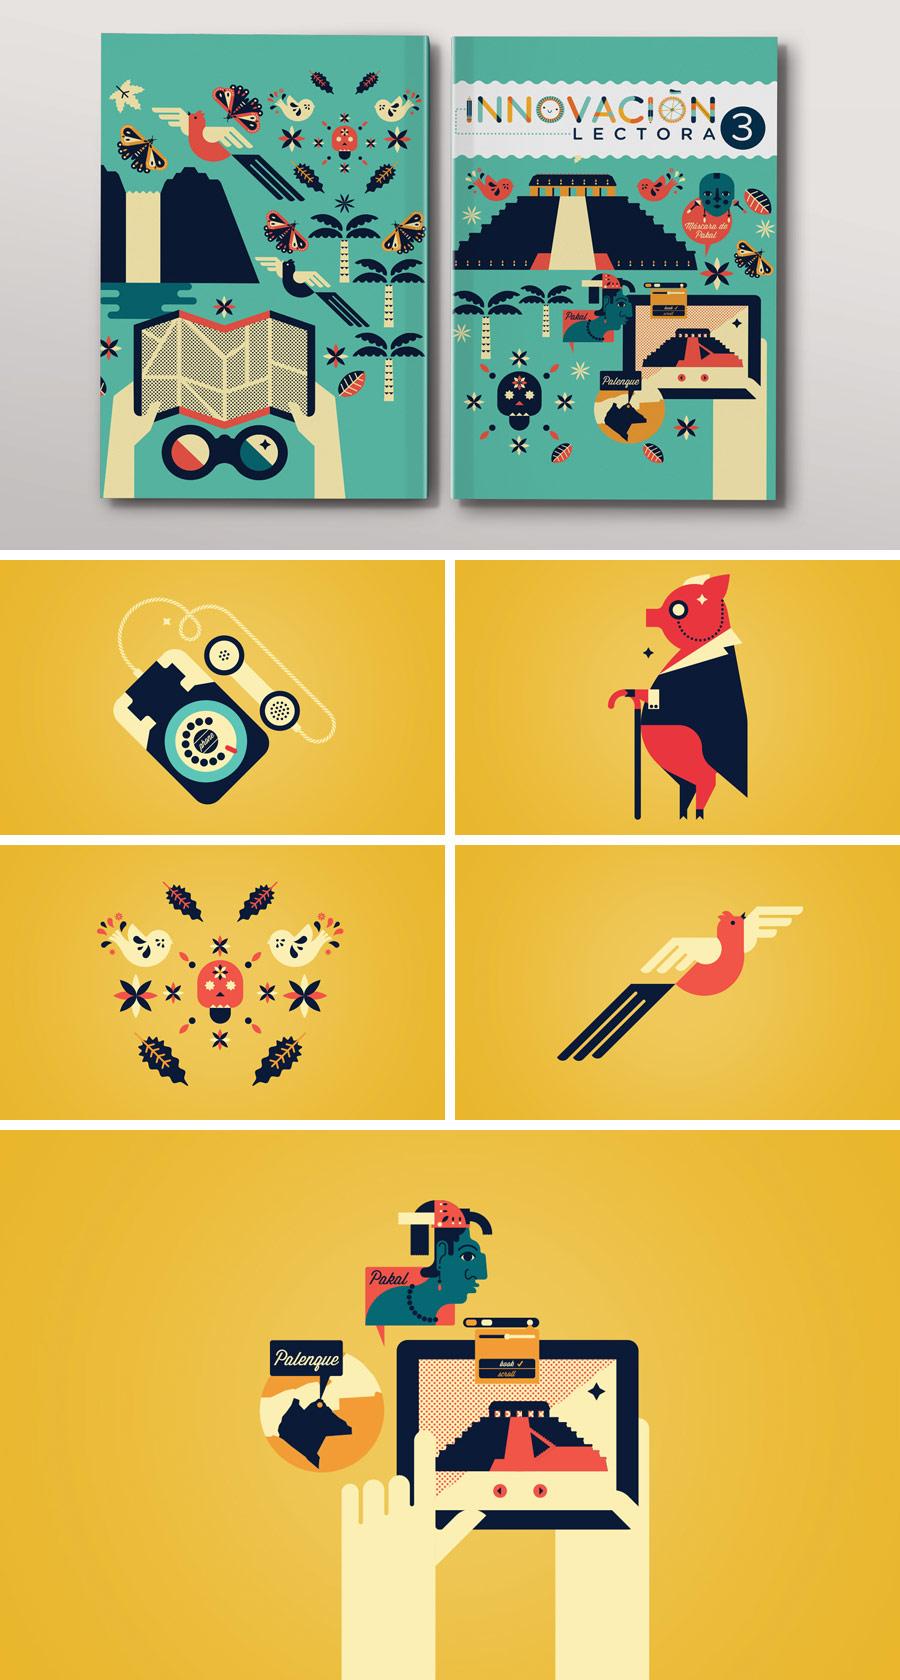 Innovacion Lectora 3 by CherryBomb